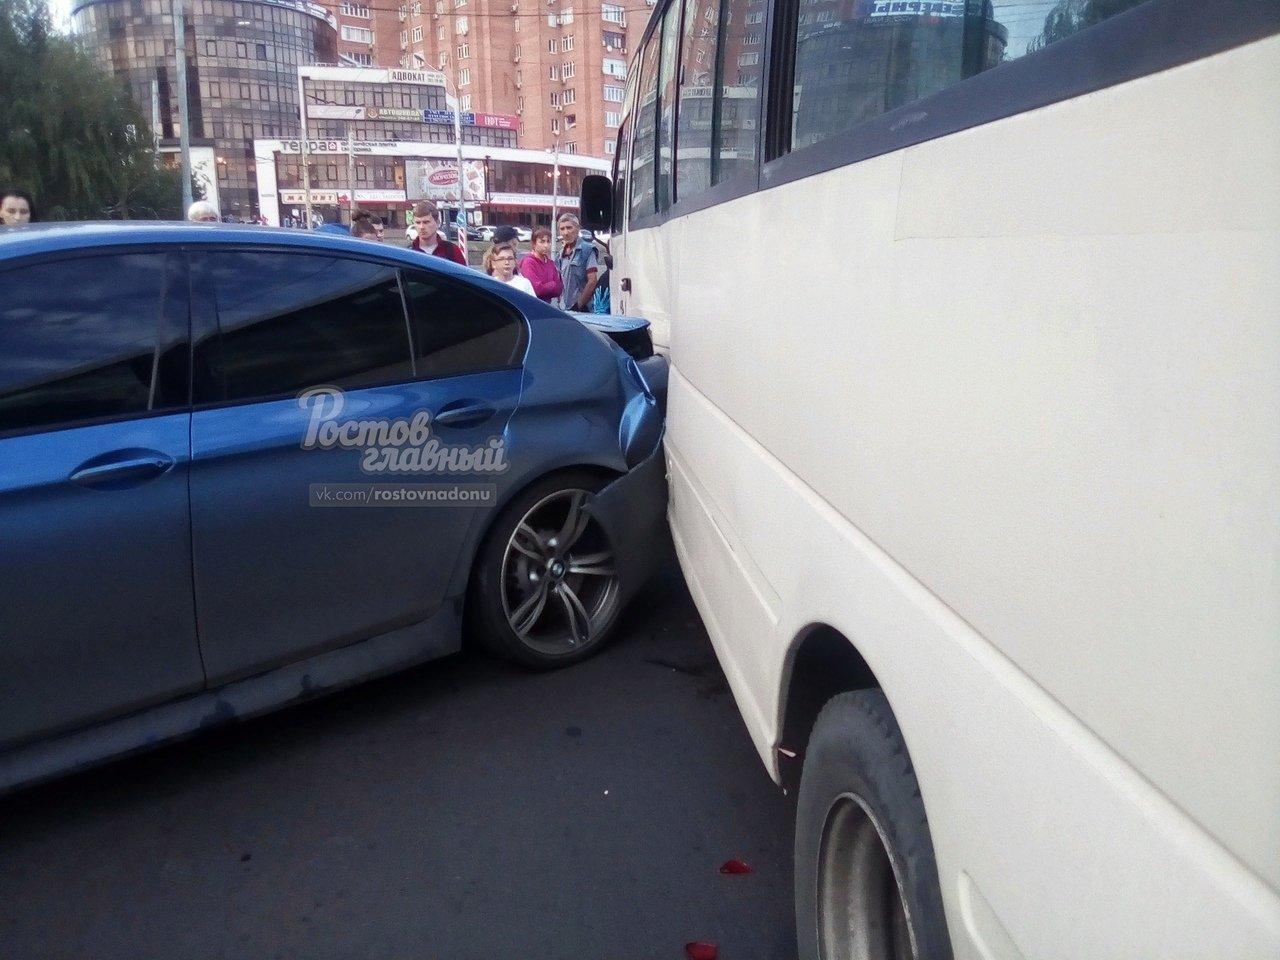 В Ростове произошло ДТП с участием маршрутного такси, фото-1